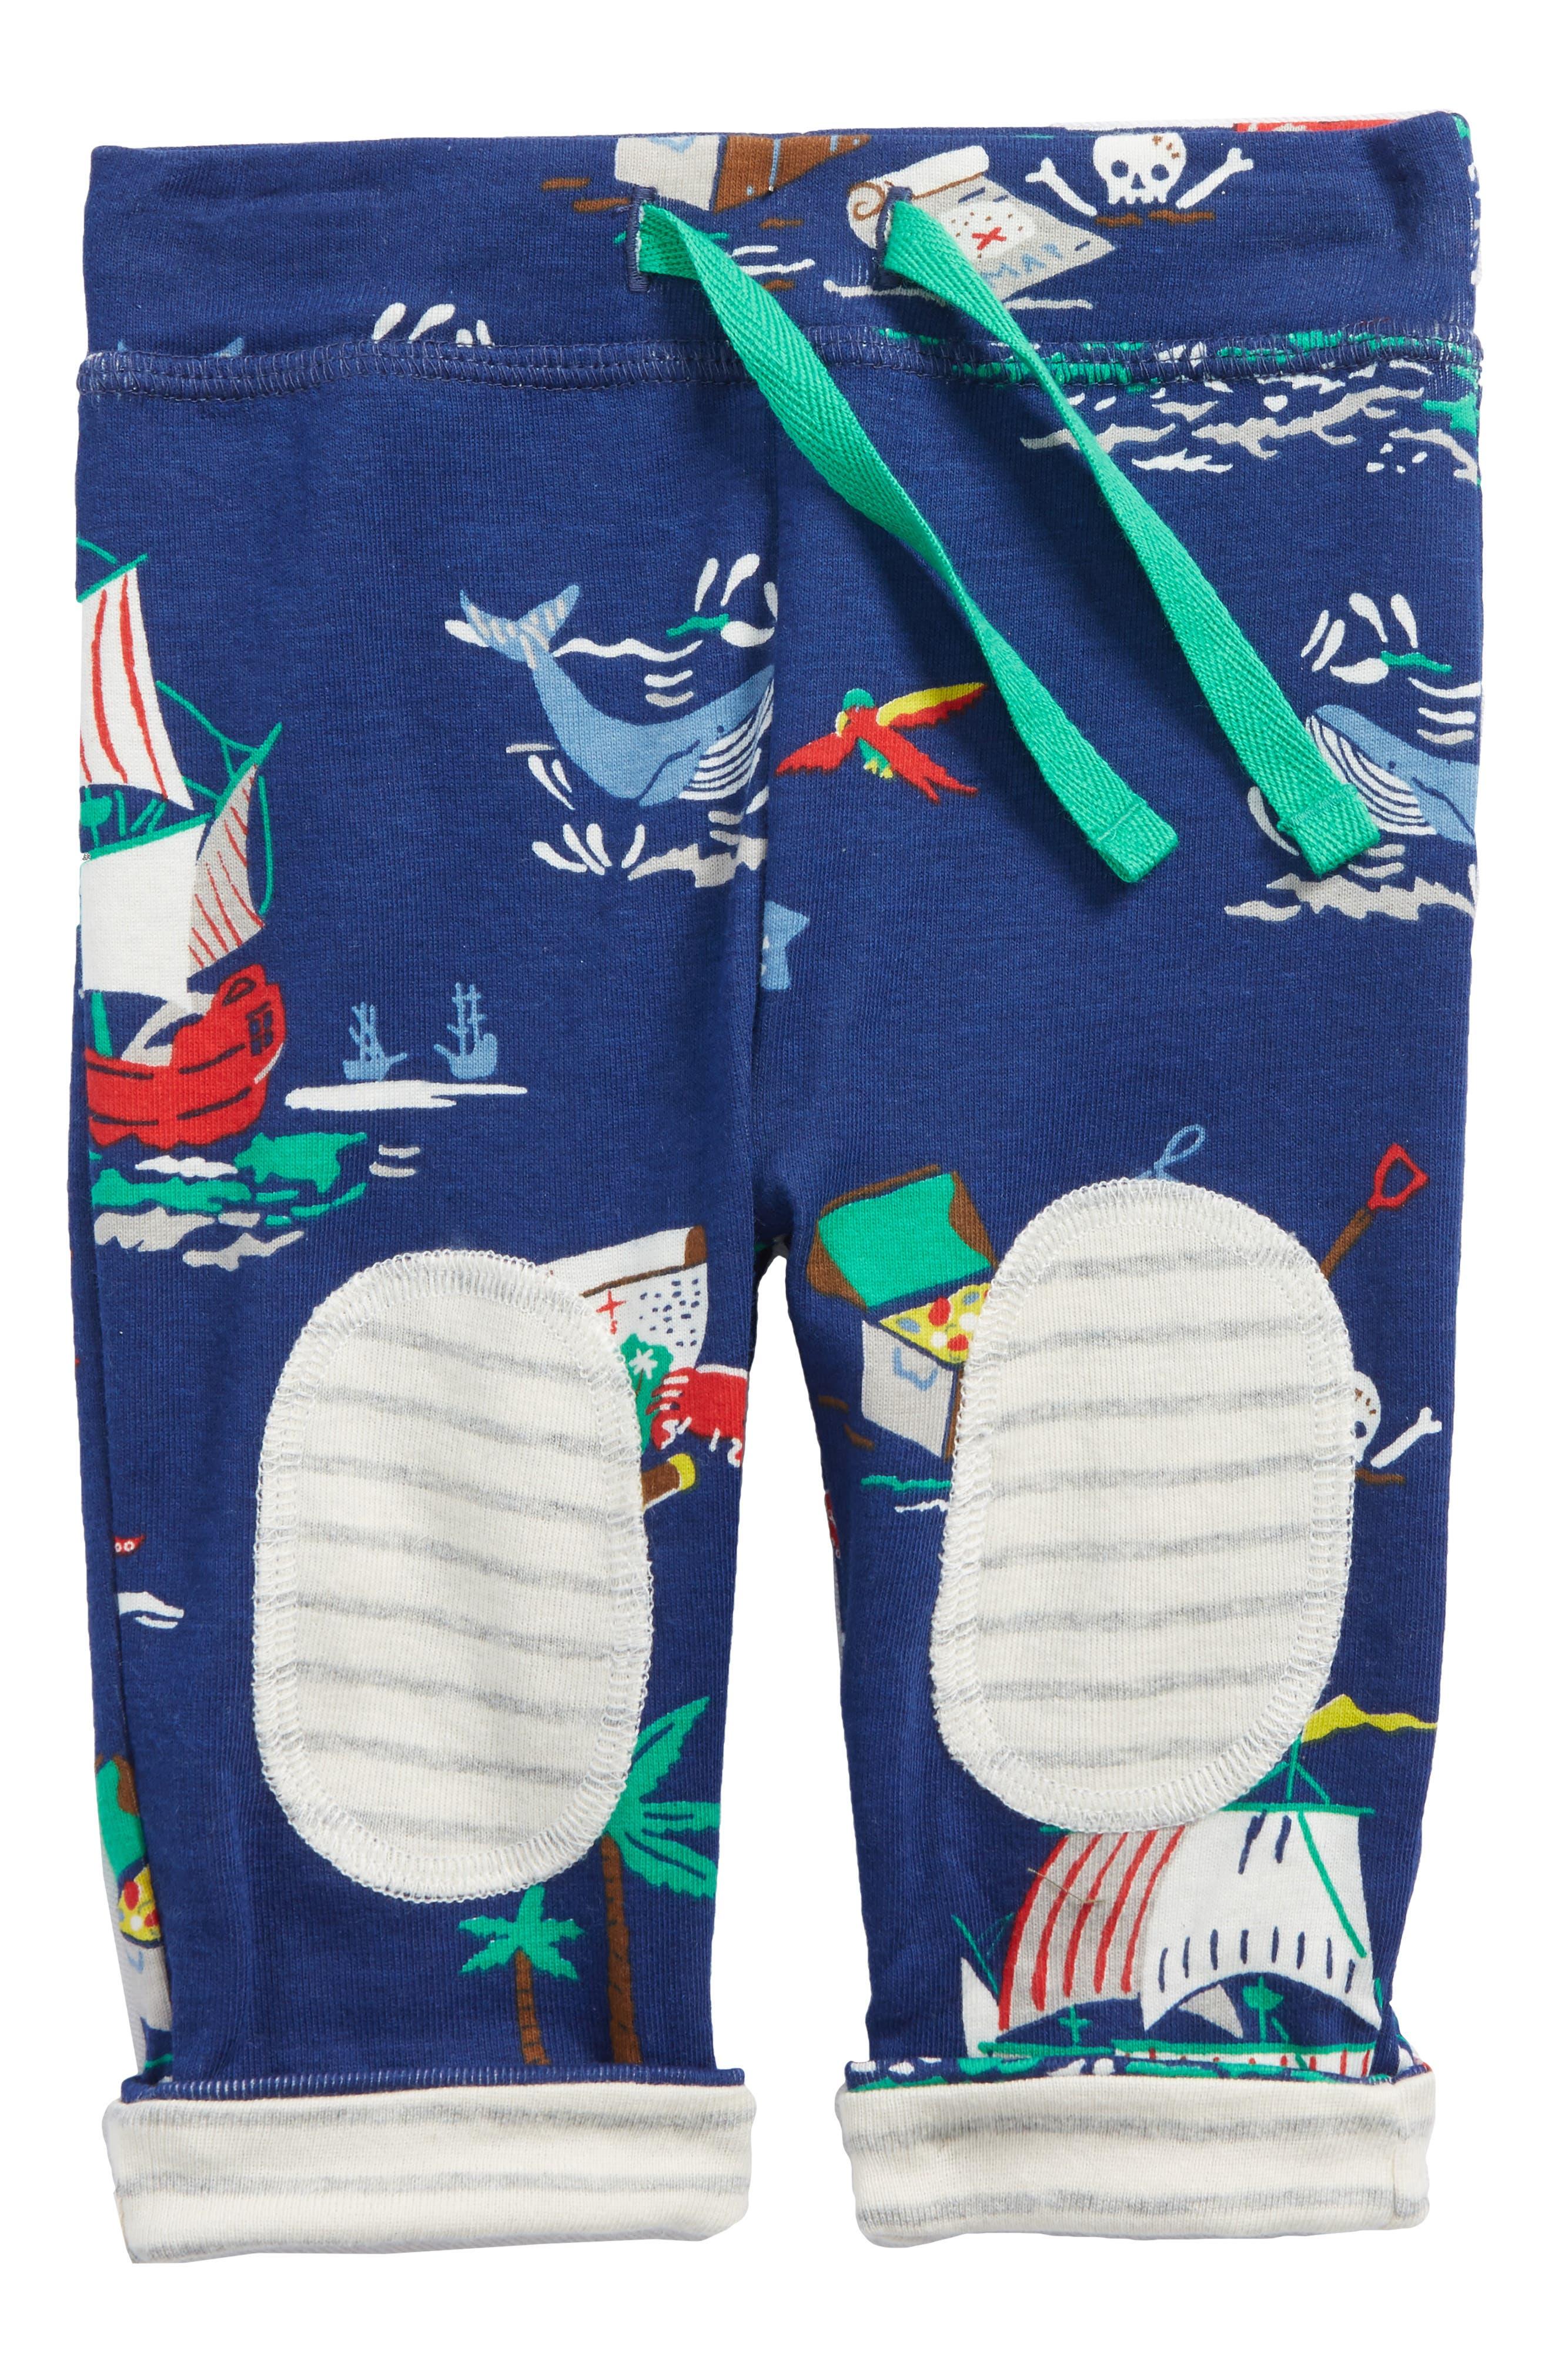 Reversible Knee Patch Pants,                             Main thumbnail 1, color,                             Beacon Blue/ Pirate Ship